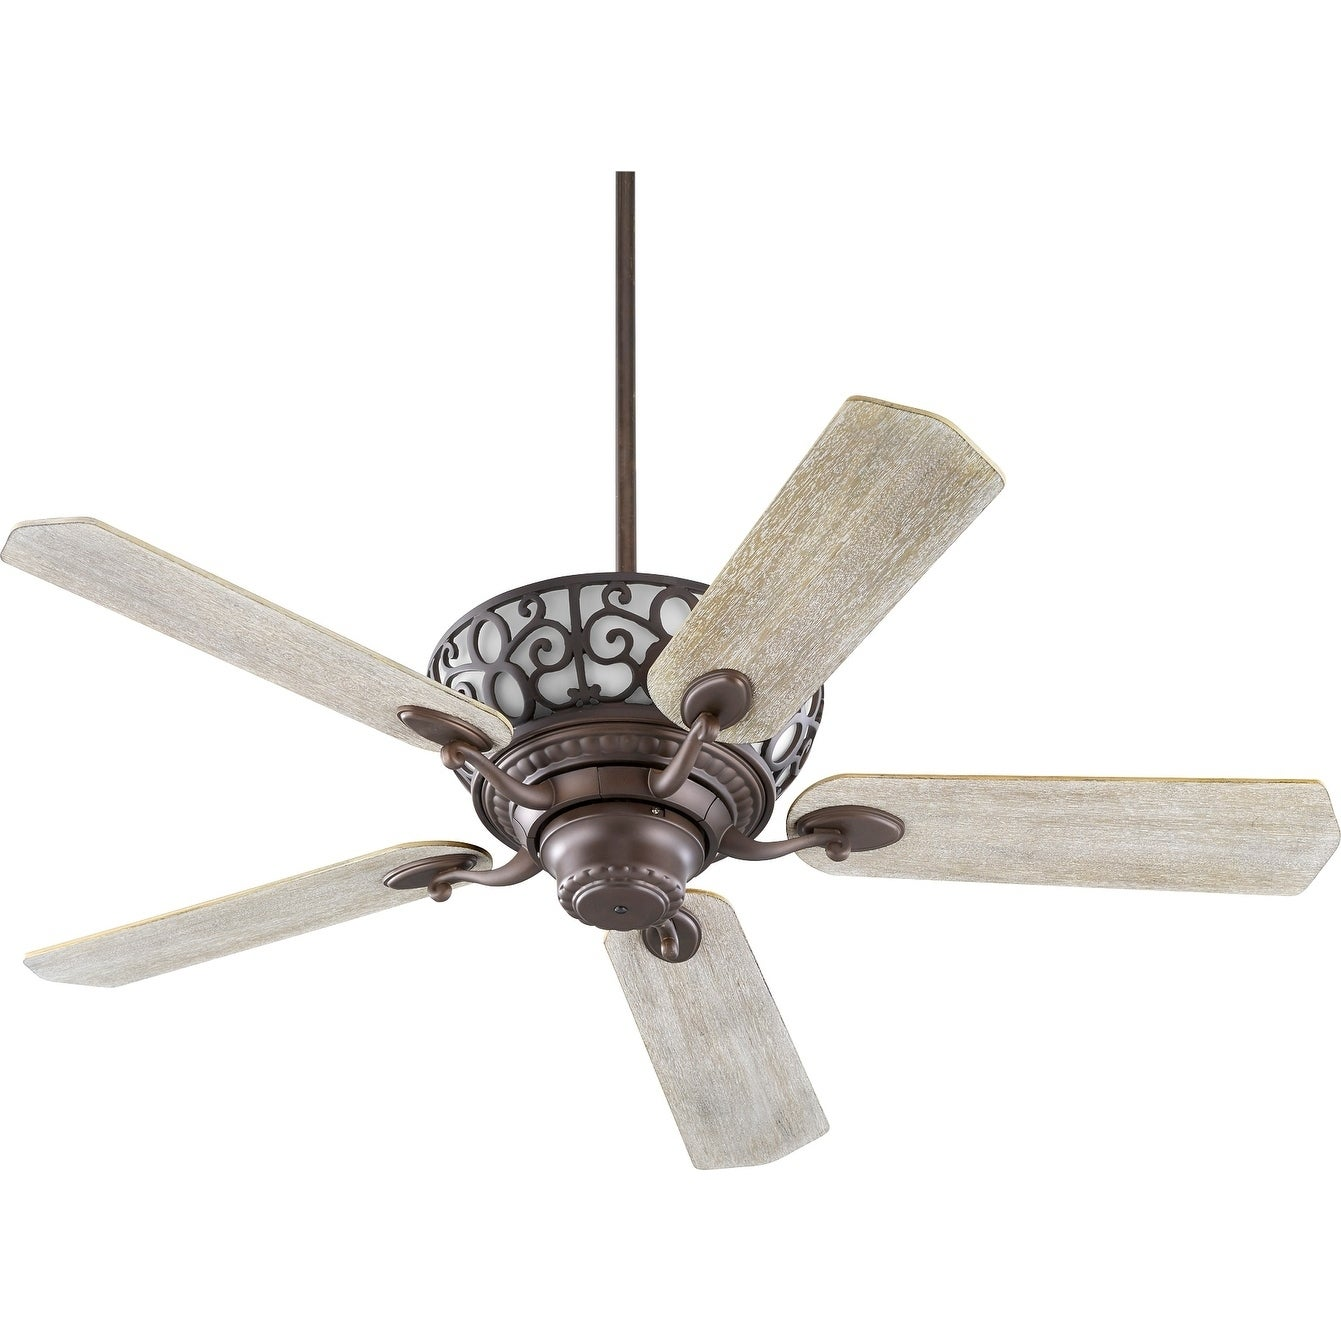 Ceiling Fan With Integraded Uplight